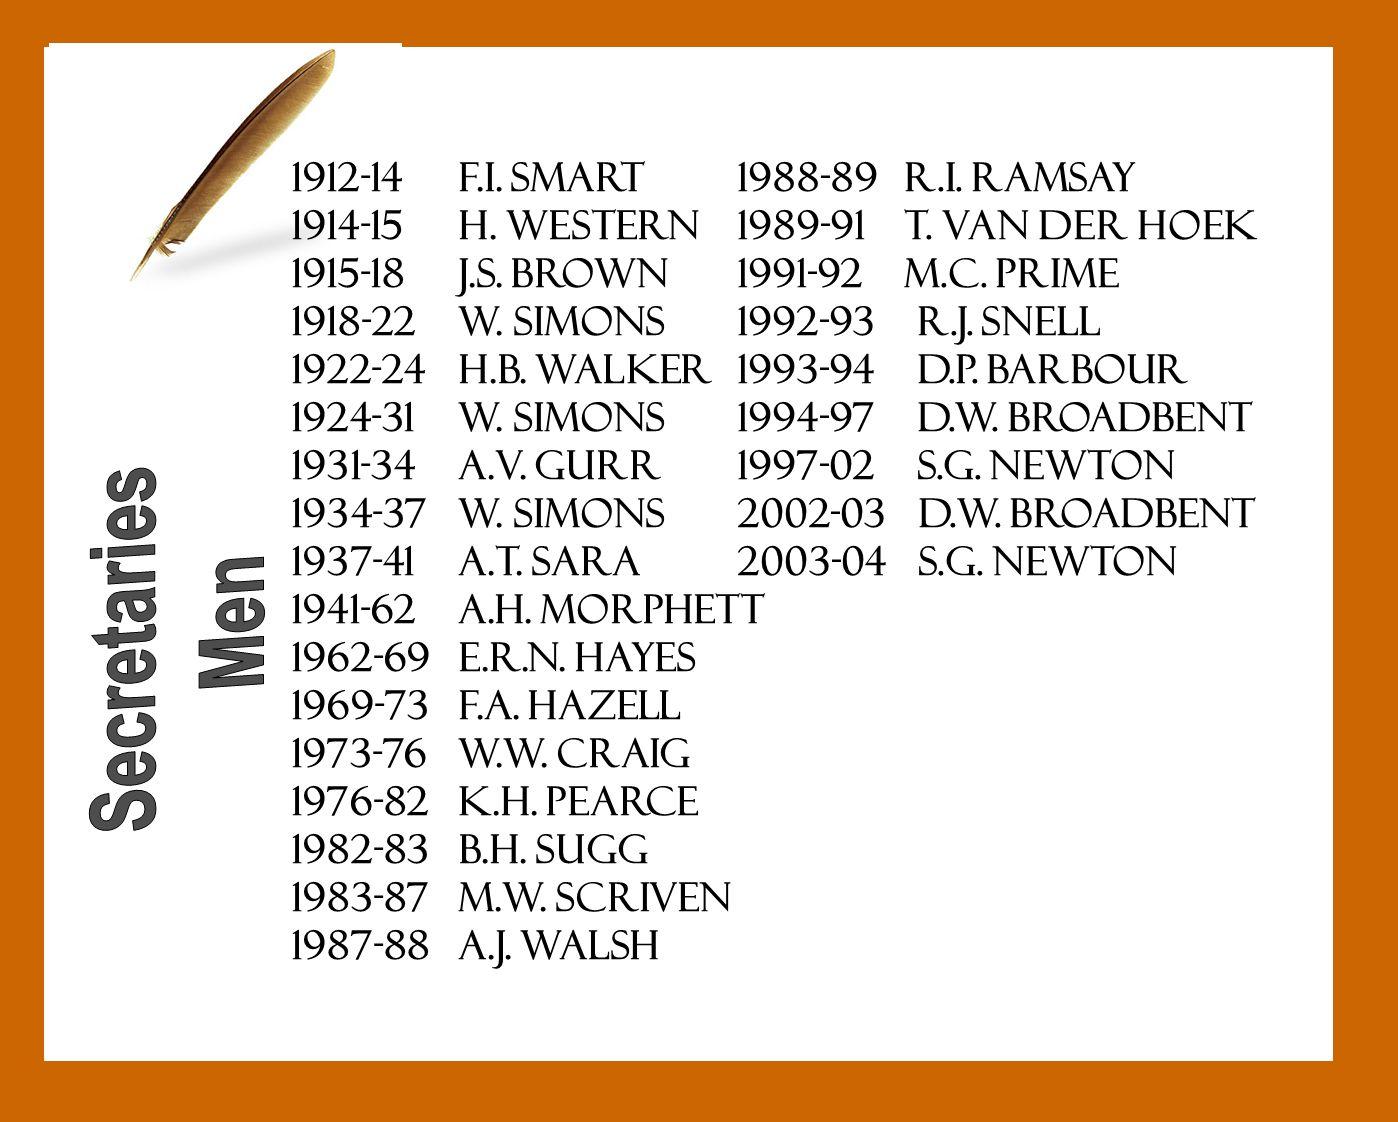 1988-89 R.I. RAMSAY 1989-91 T. VAN DER HOEK 1991-92 M.C. PRIME 1992-93 R.J. SNELL 1993-94 D.P. BARBOUR 1994-97 D.W. bROADBENT 1997-02 S.G. NEWTON 2002